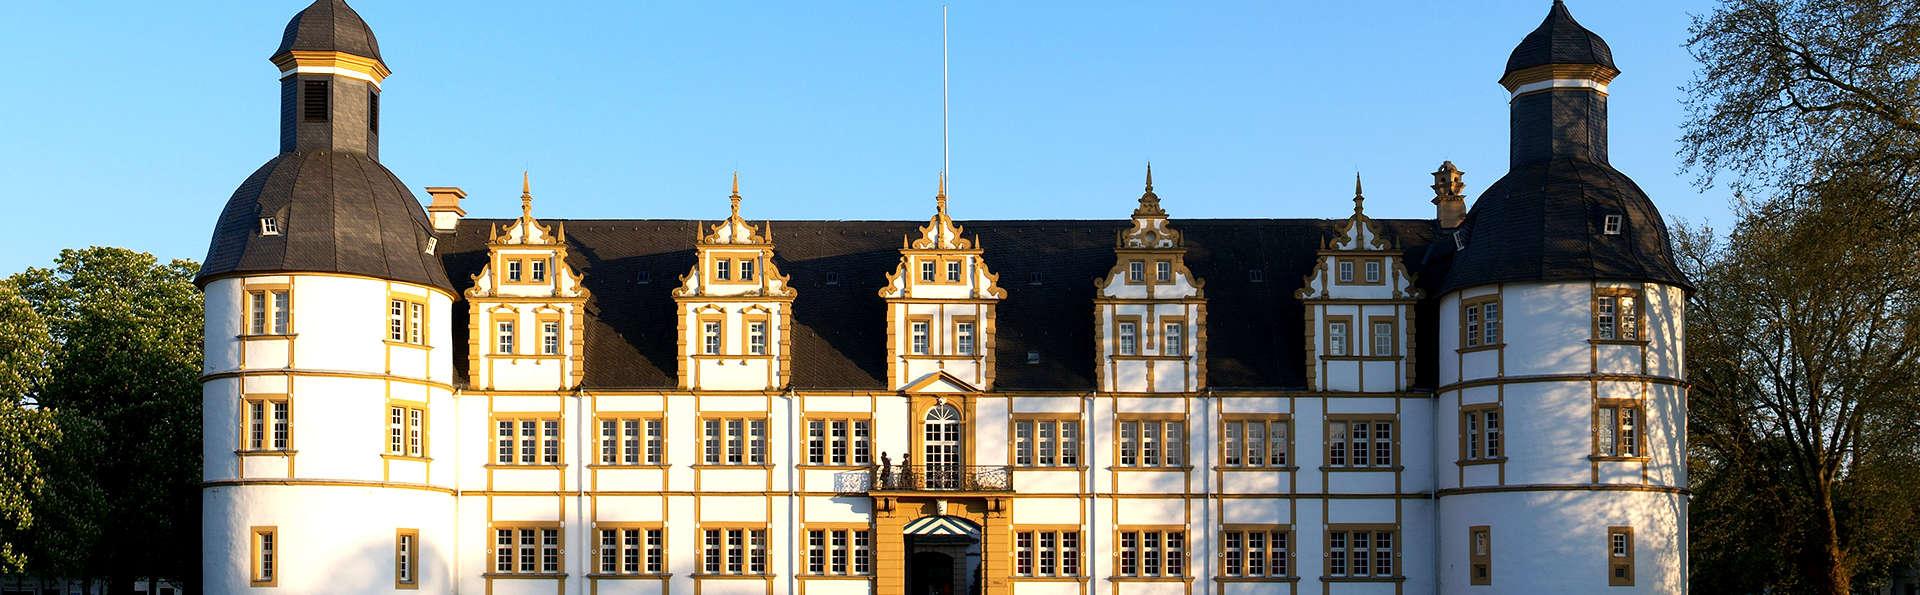 Hotel Schloß Gehrden  - Edit_Paderborn.jpg